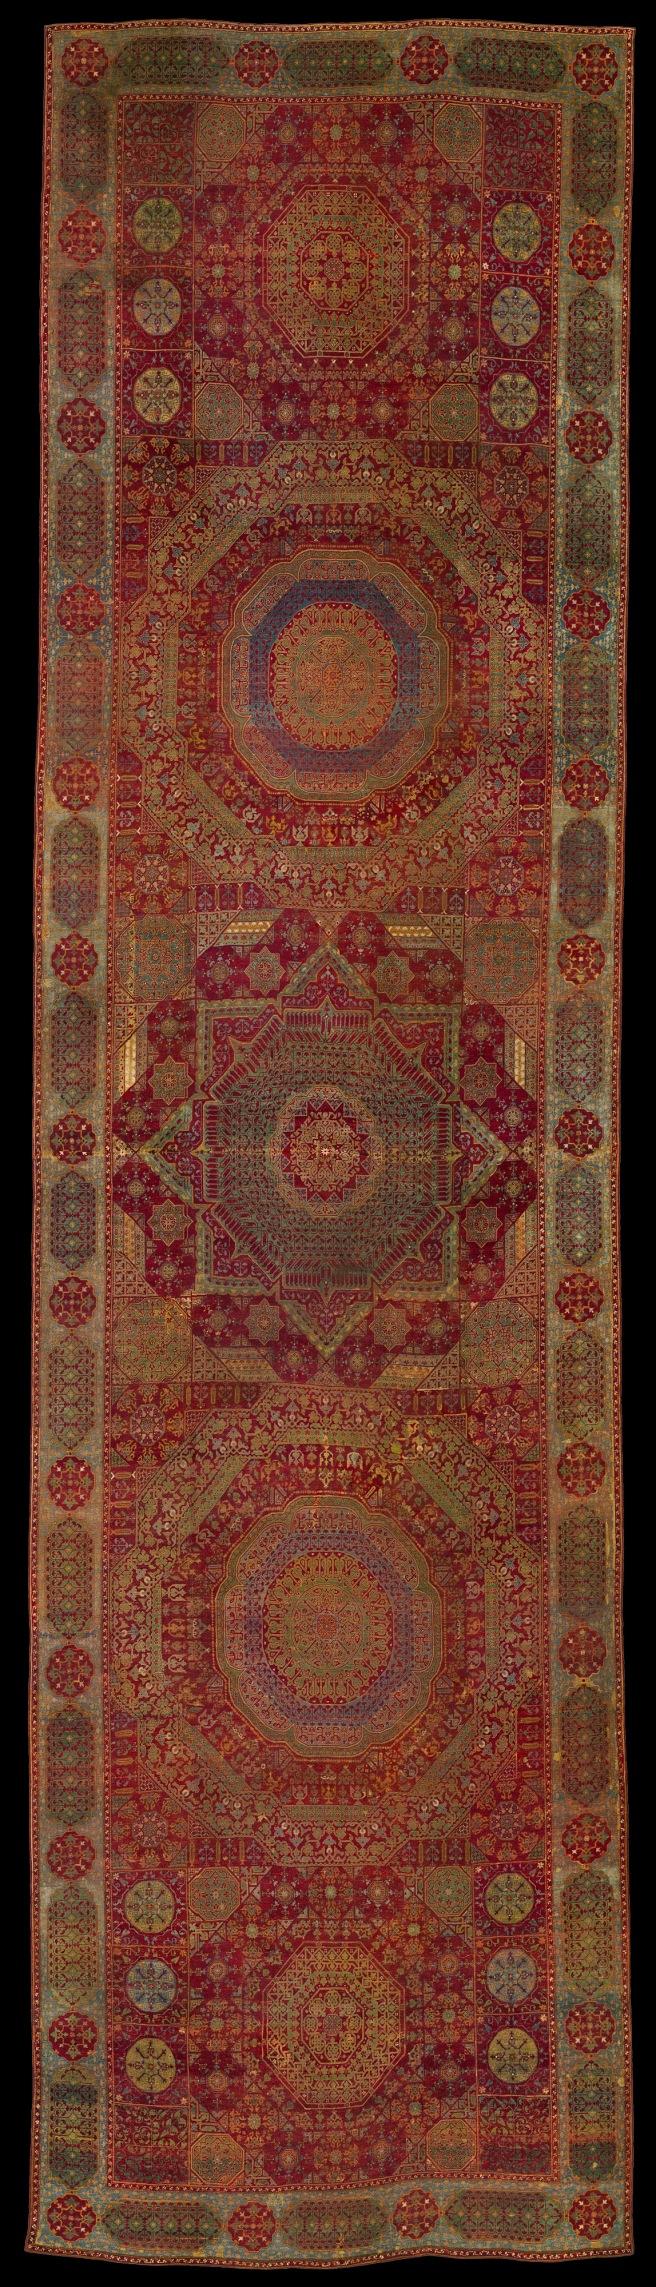 the_simonetti_mamluk_carpet_metropolitan_museum_of_art.jpg